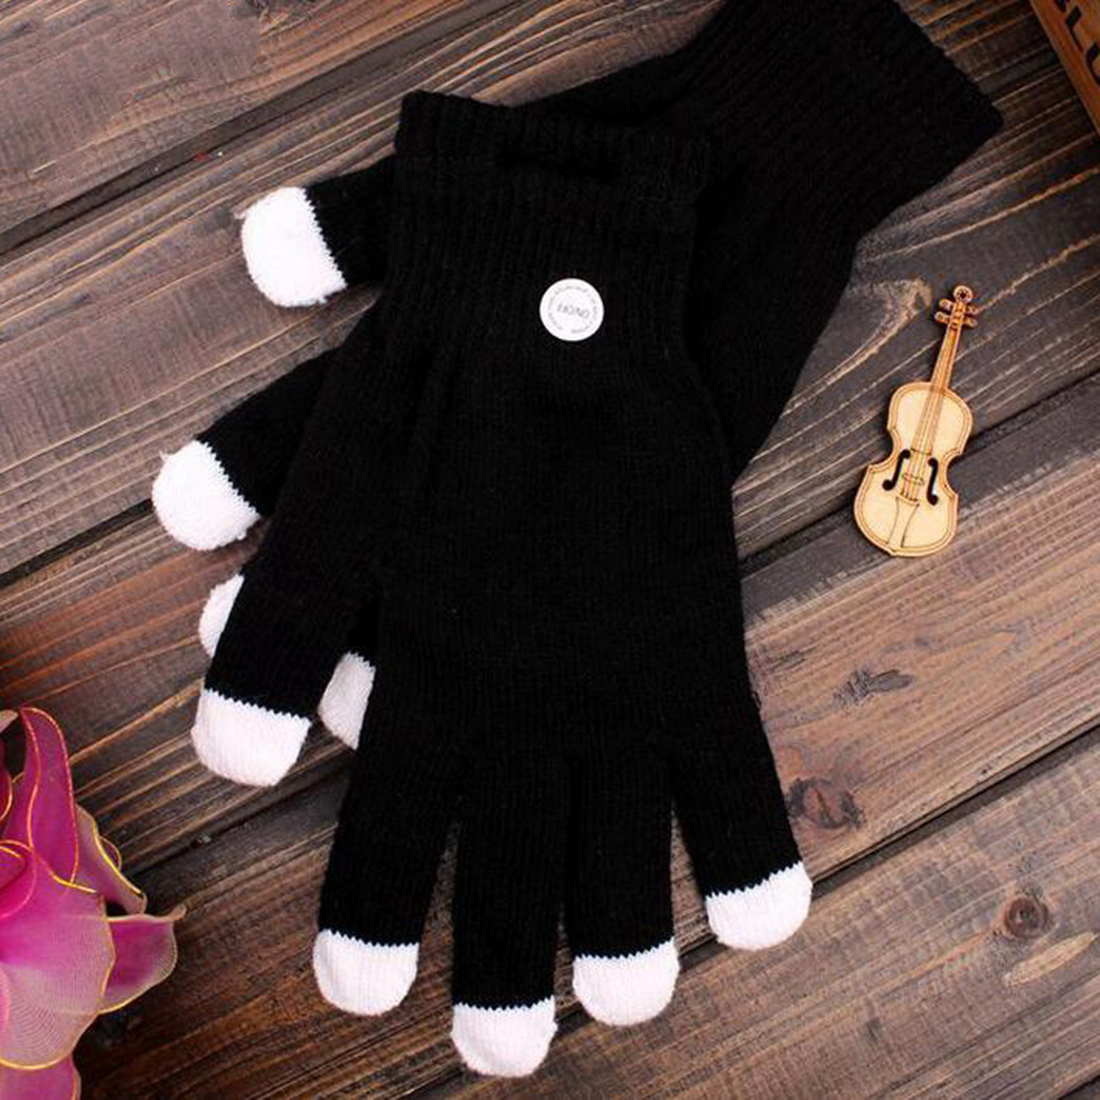 New Magic Flash Fingertip Led Gloves Unisex Light Up Glow Stick Gloves Mittens Fingertip Led Luminous Gloves Apparel Accessories